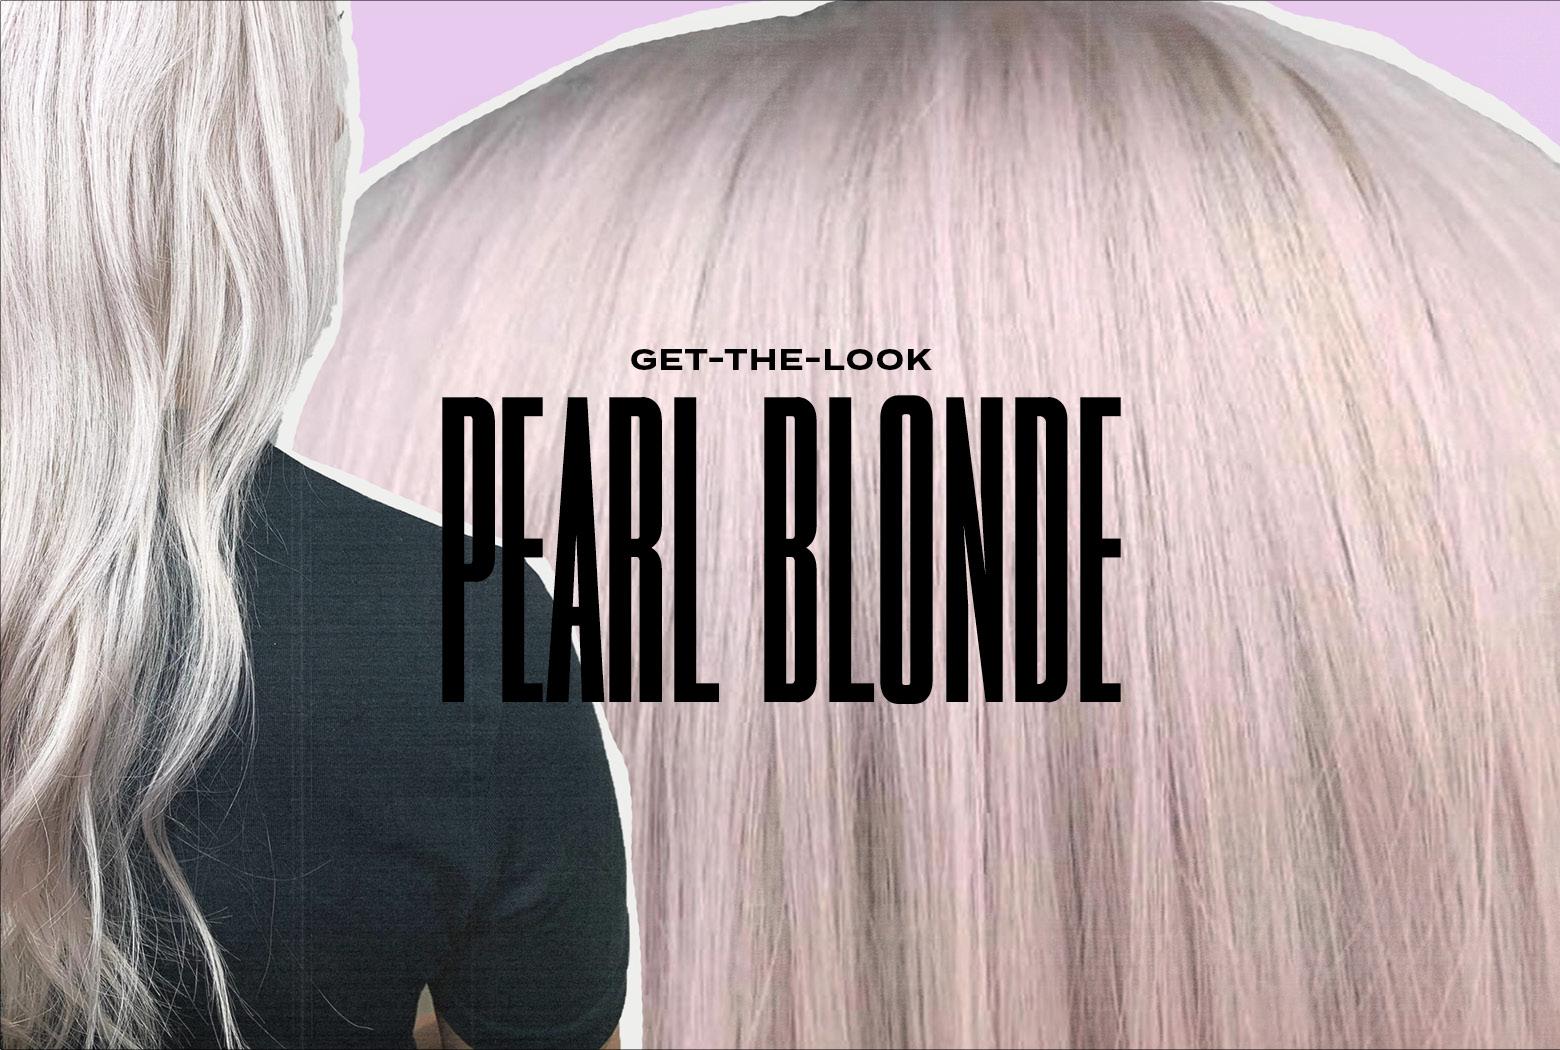 Pearl Blonde image